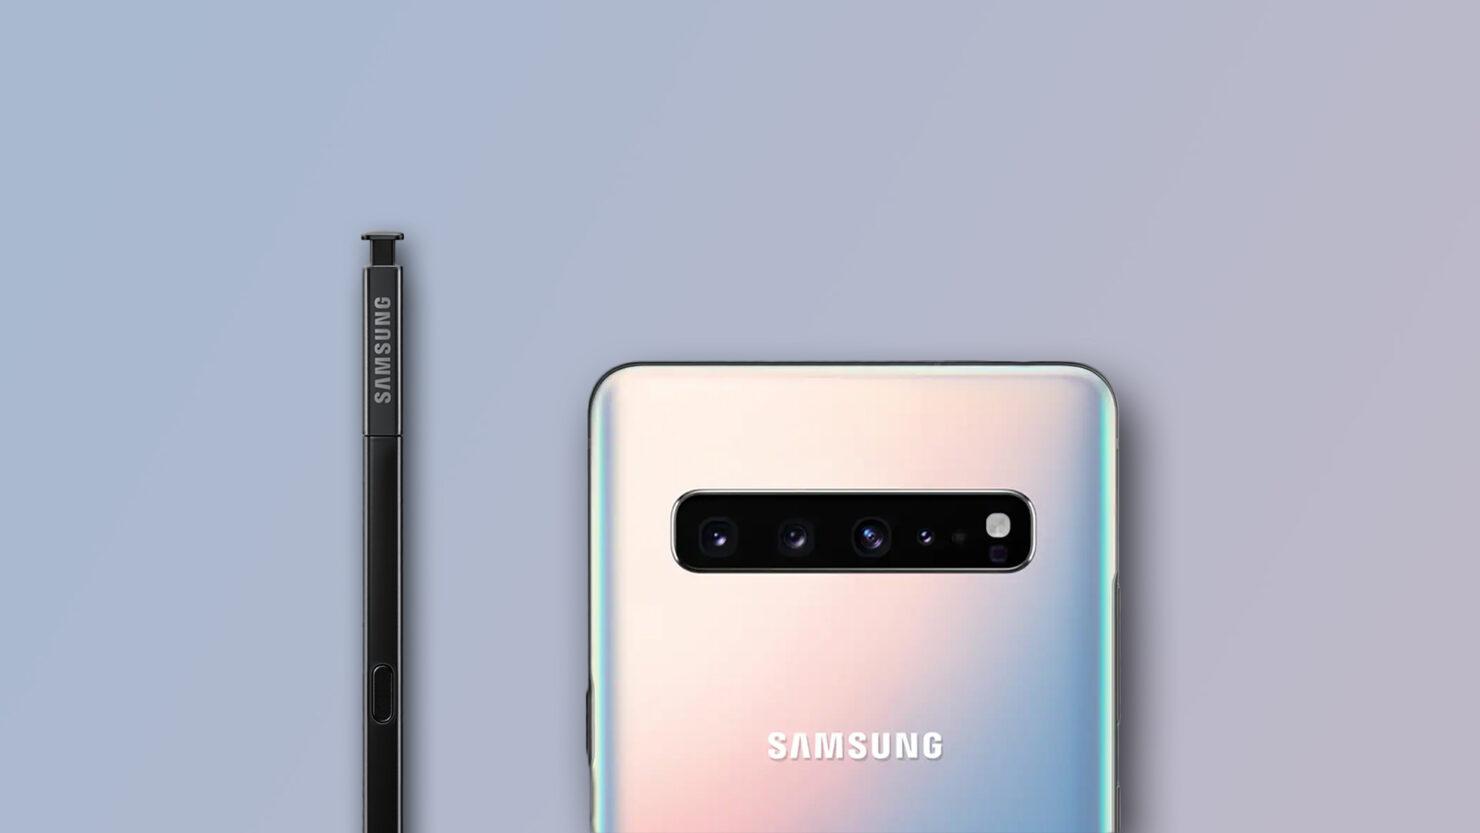 Smaller Galaxy Note 10 fewer cameras